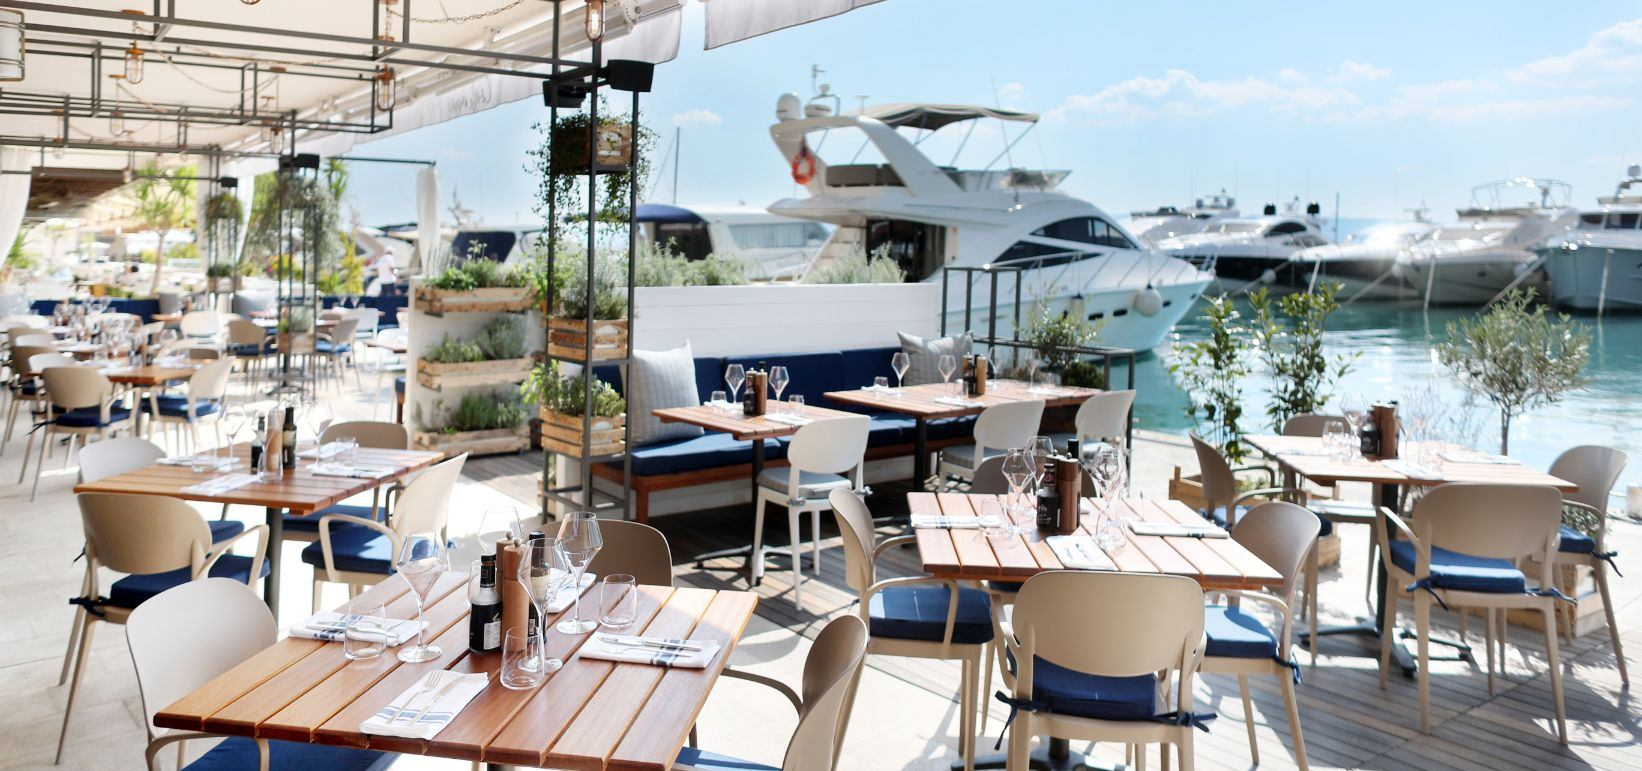 FOTO: Očaravajući interijer novootvorenog Restorana Conlemani Hotela Le Mėridien LAV Split